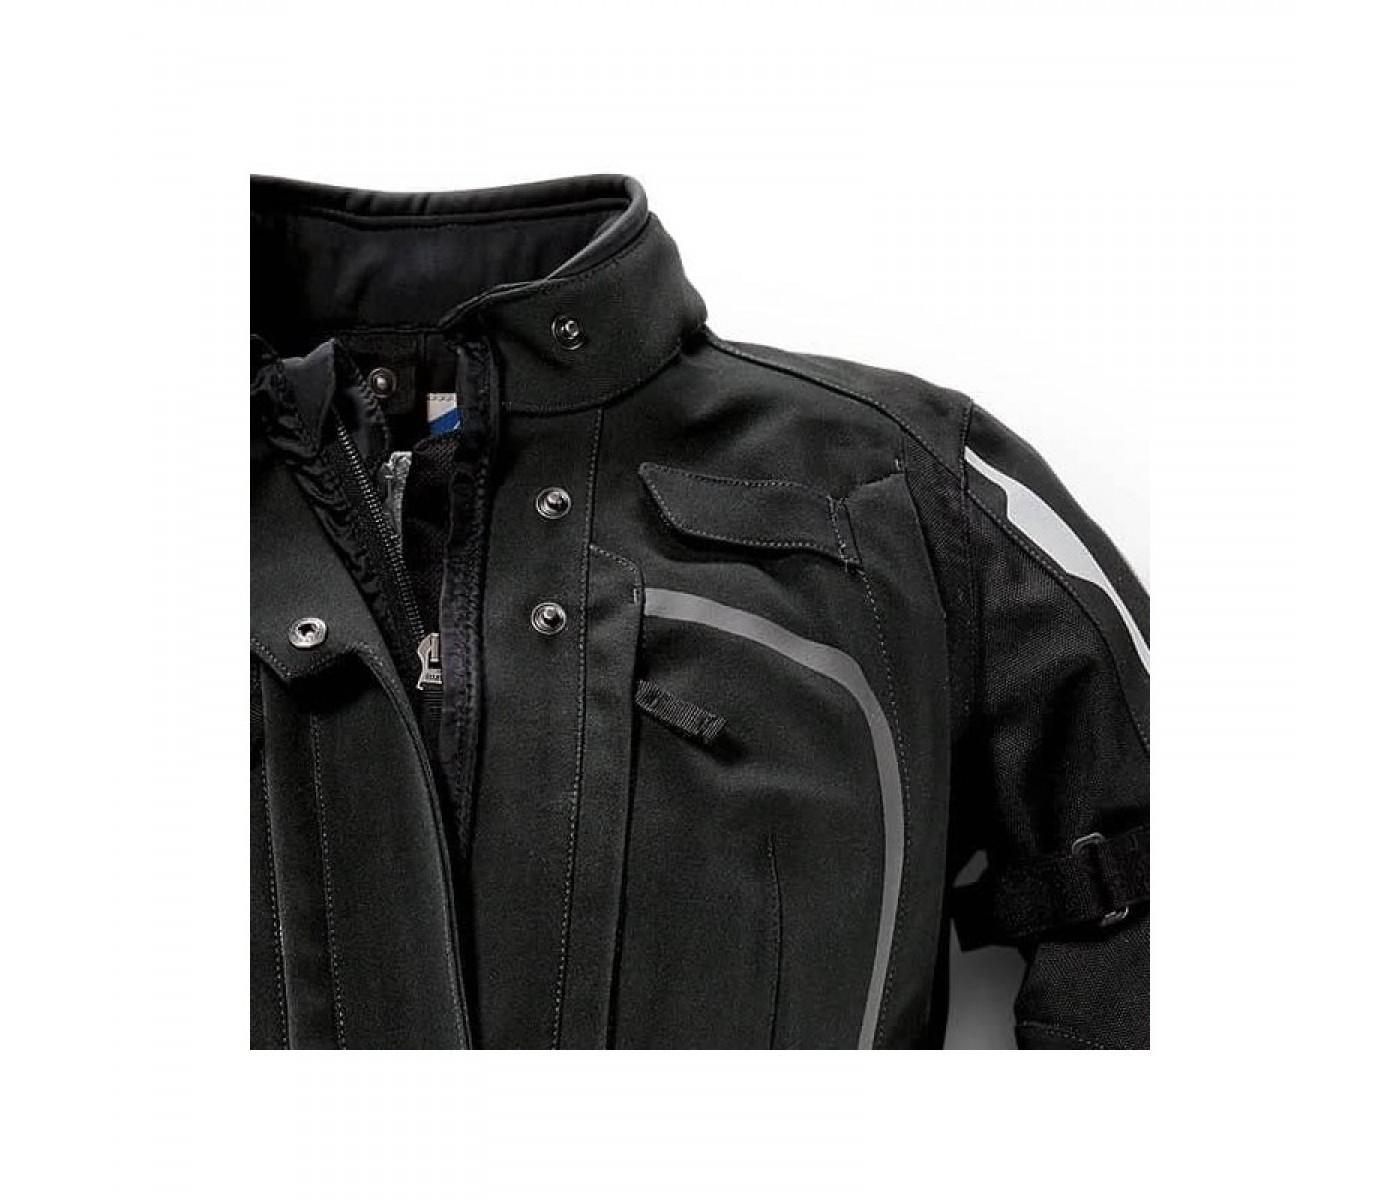 ... BMW Motorrad Μπουφάν Γυναικείο EnduroGuard Jacket Women Black ΕΝΔΥΣΗ ... e6ec4ea6cc0